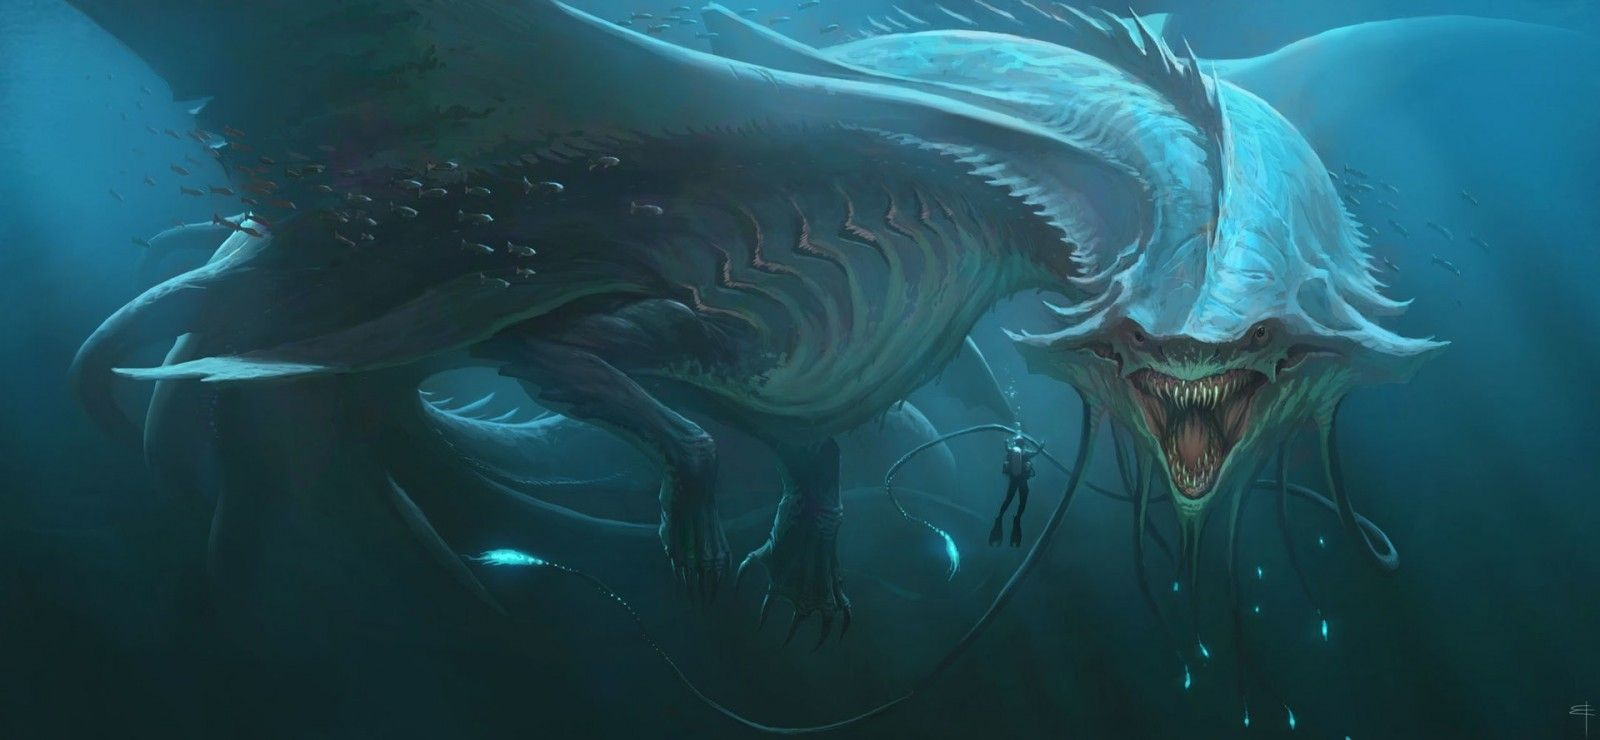 Sea Monster Wallpapers Background Sea Monsters Monster Art Fantasy Creatures